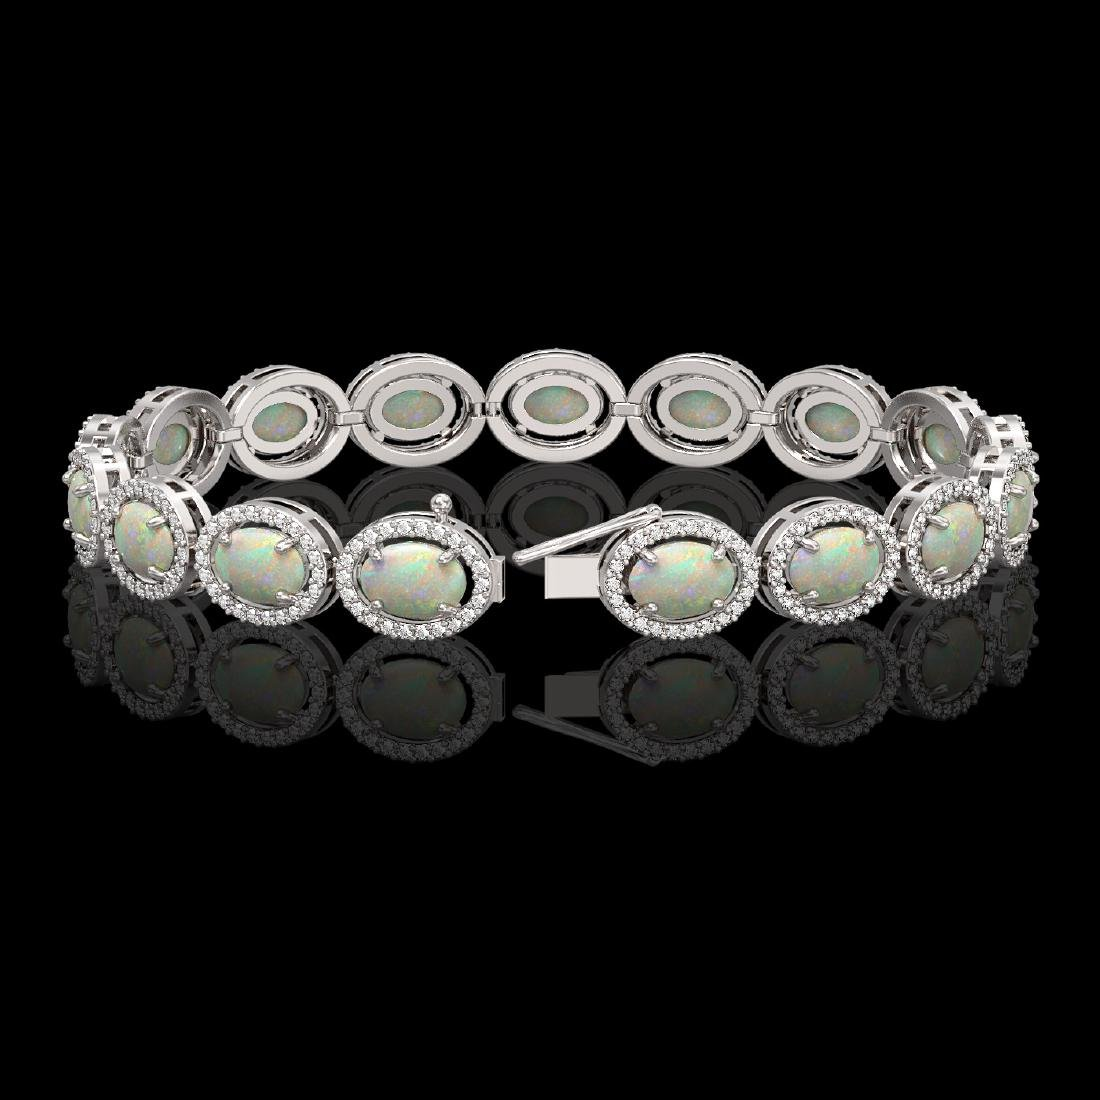 14.24 CTW Opal & Diamond Halo Bracelet 10K White Gold - 2